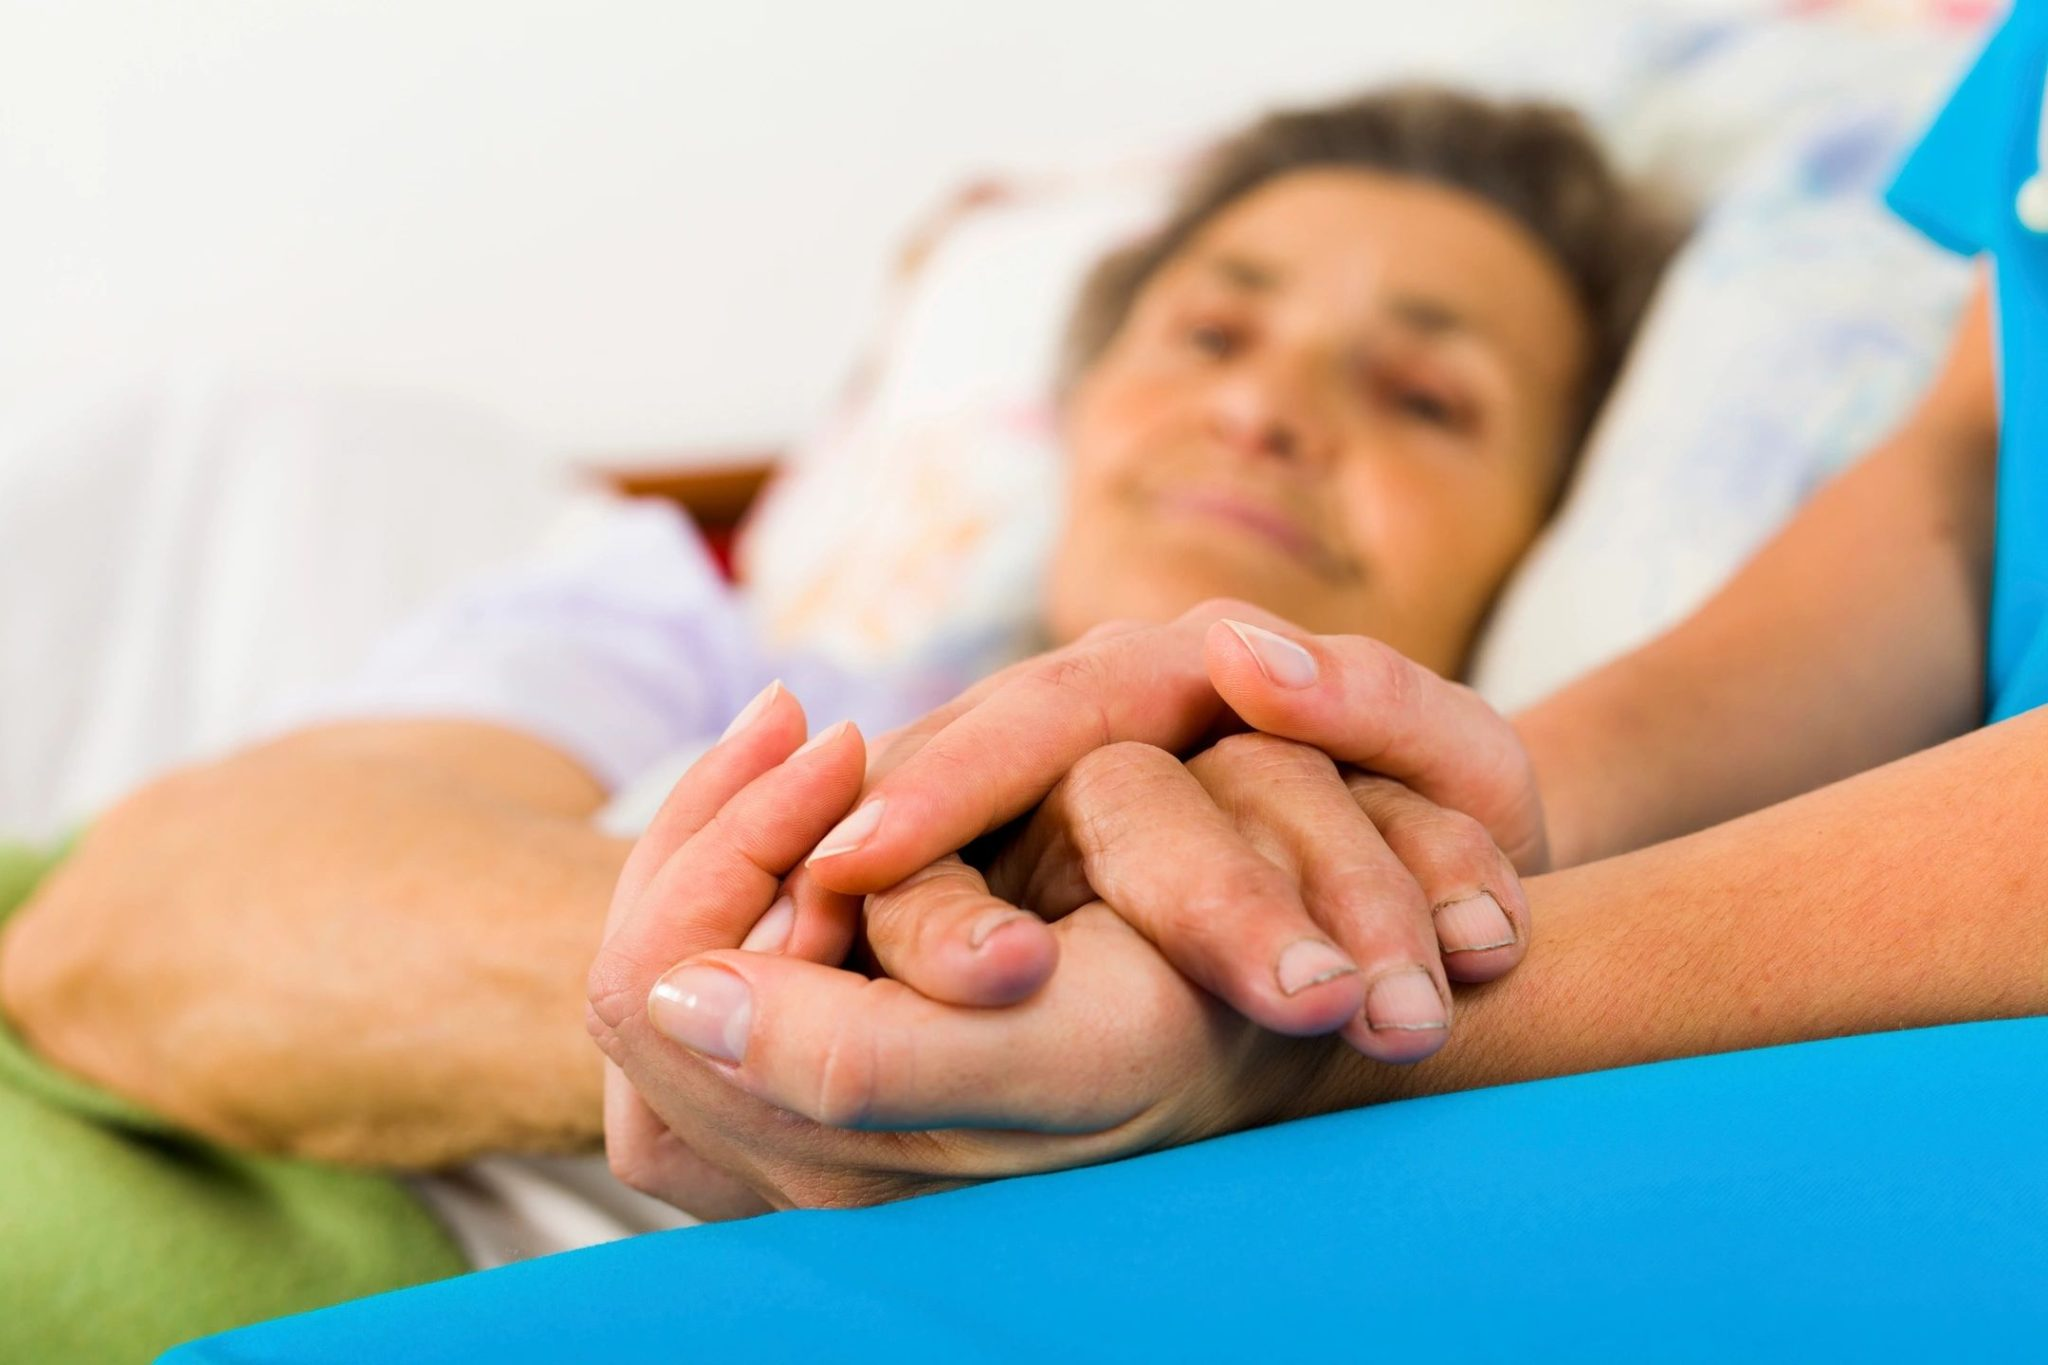 Personal Senior Care